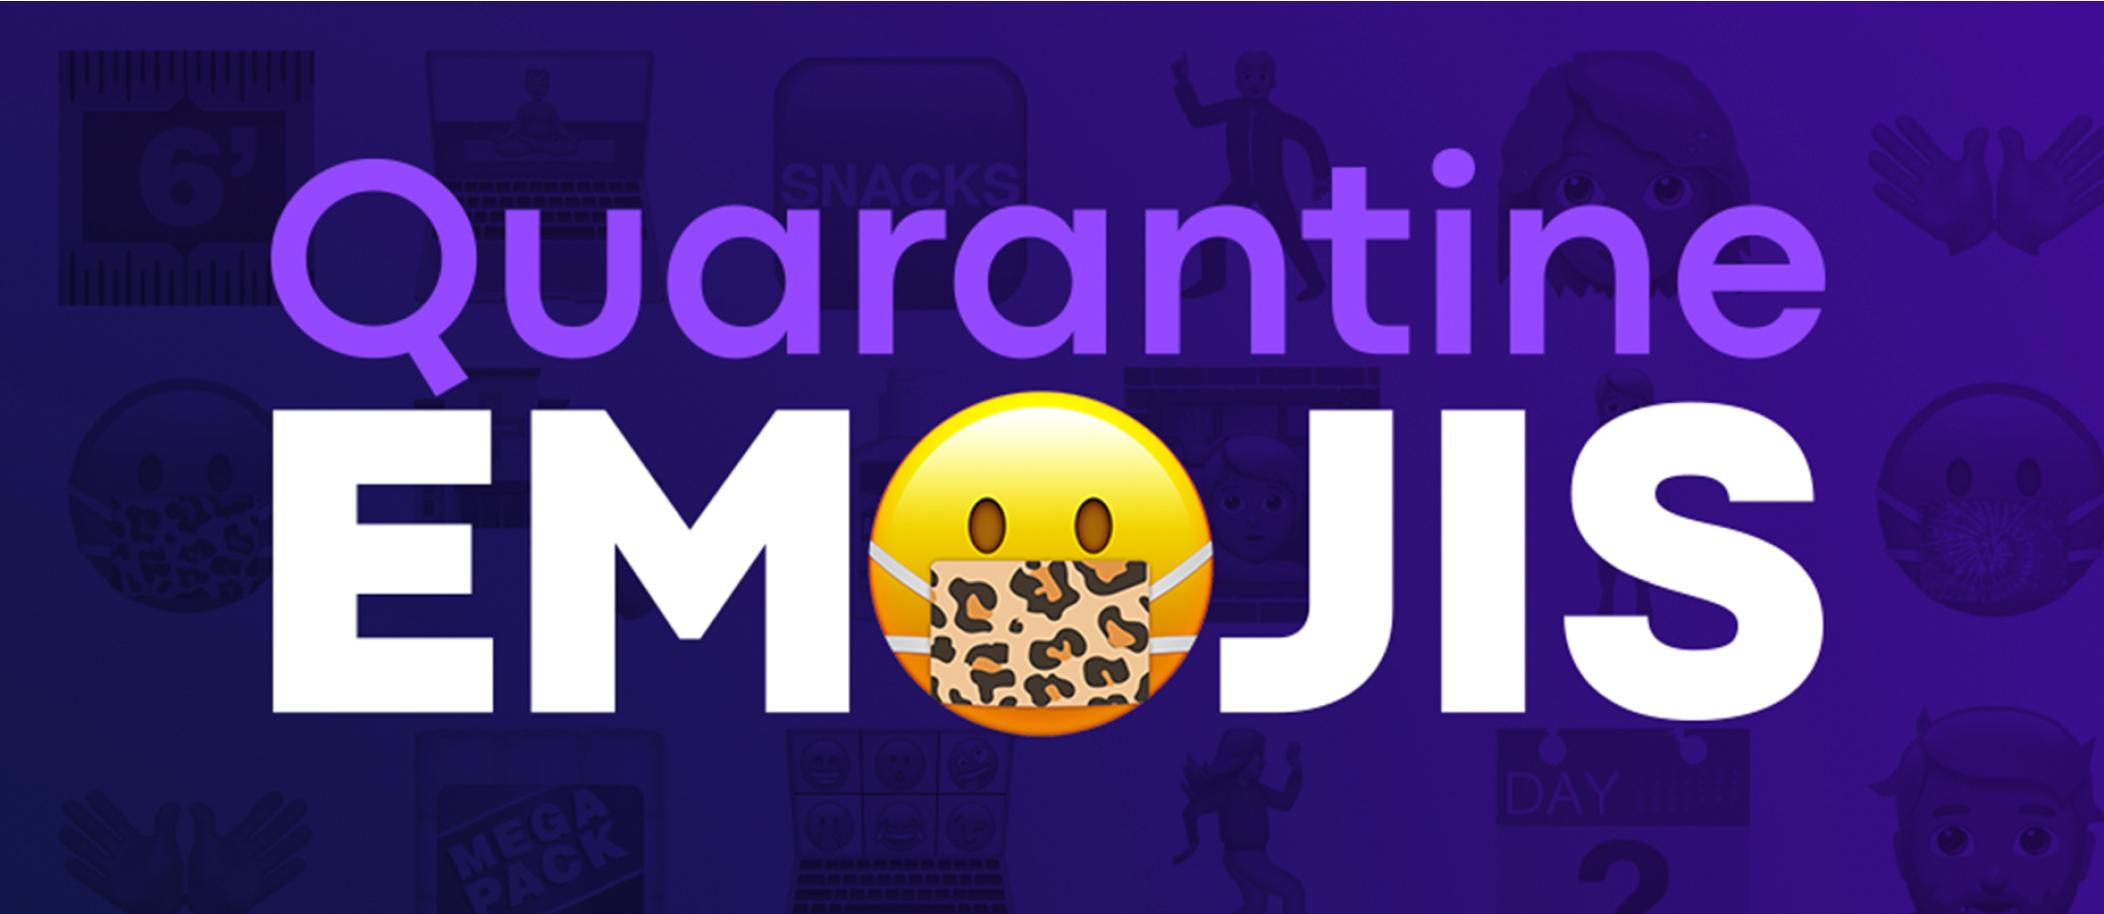 Quarantine emojis